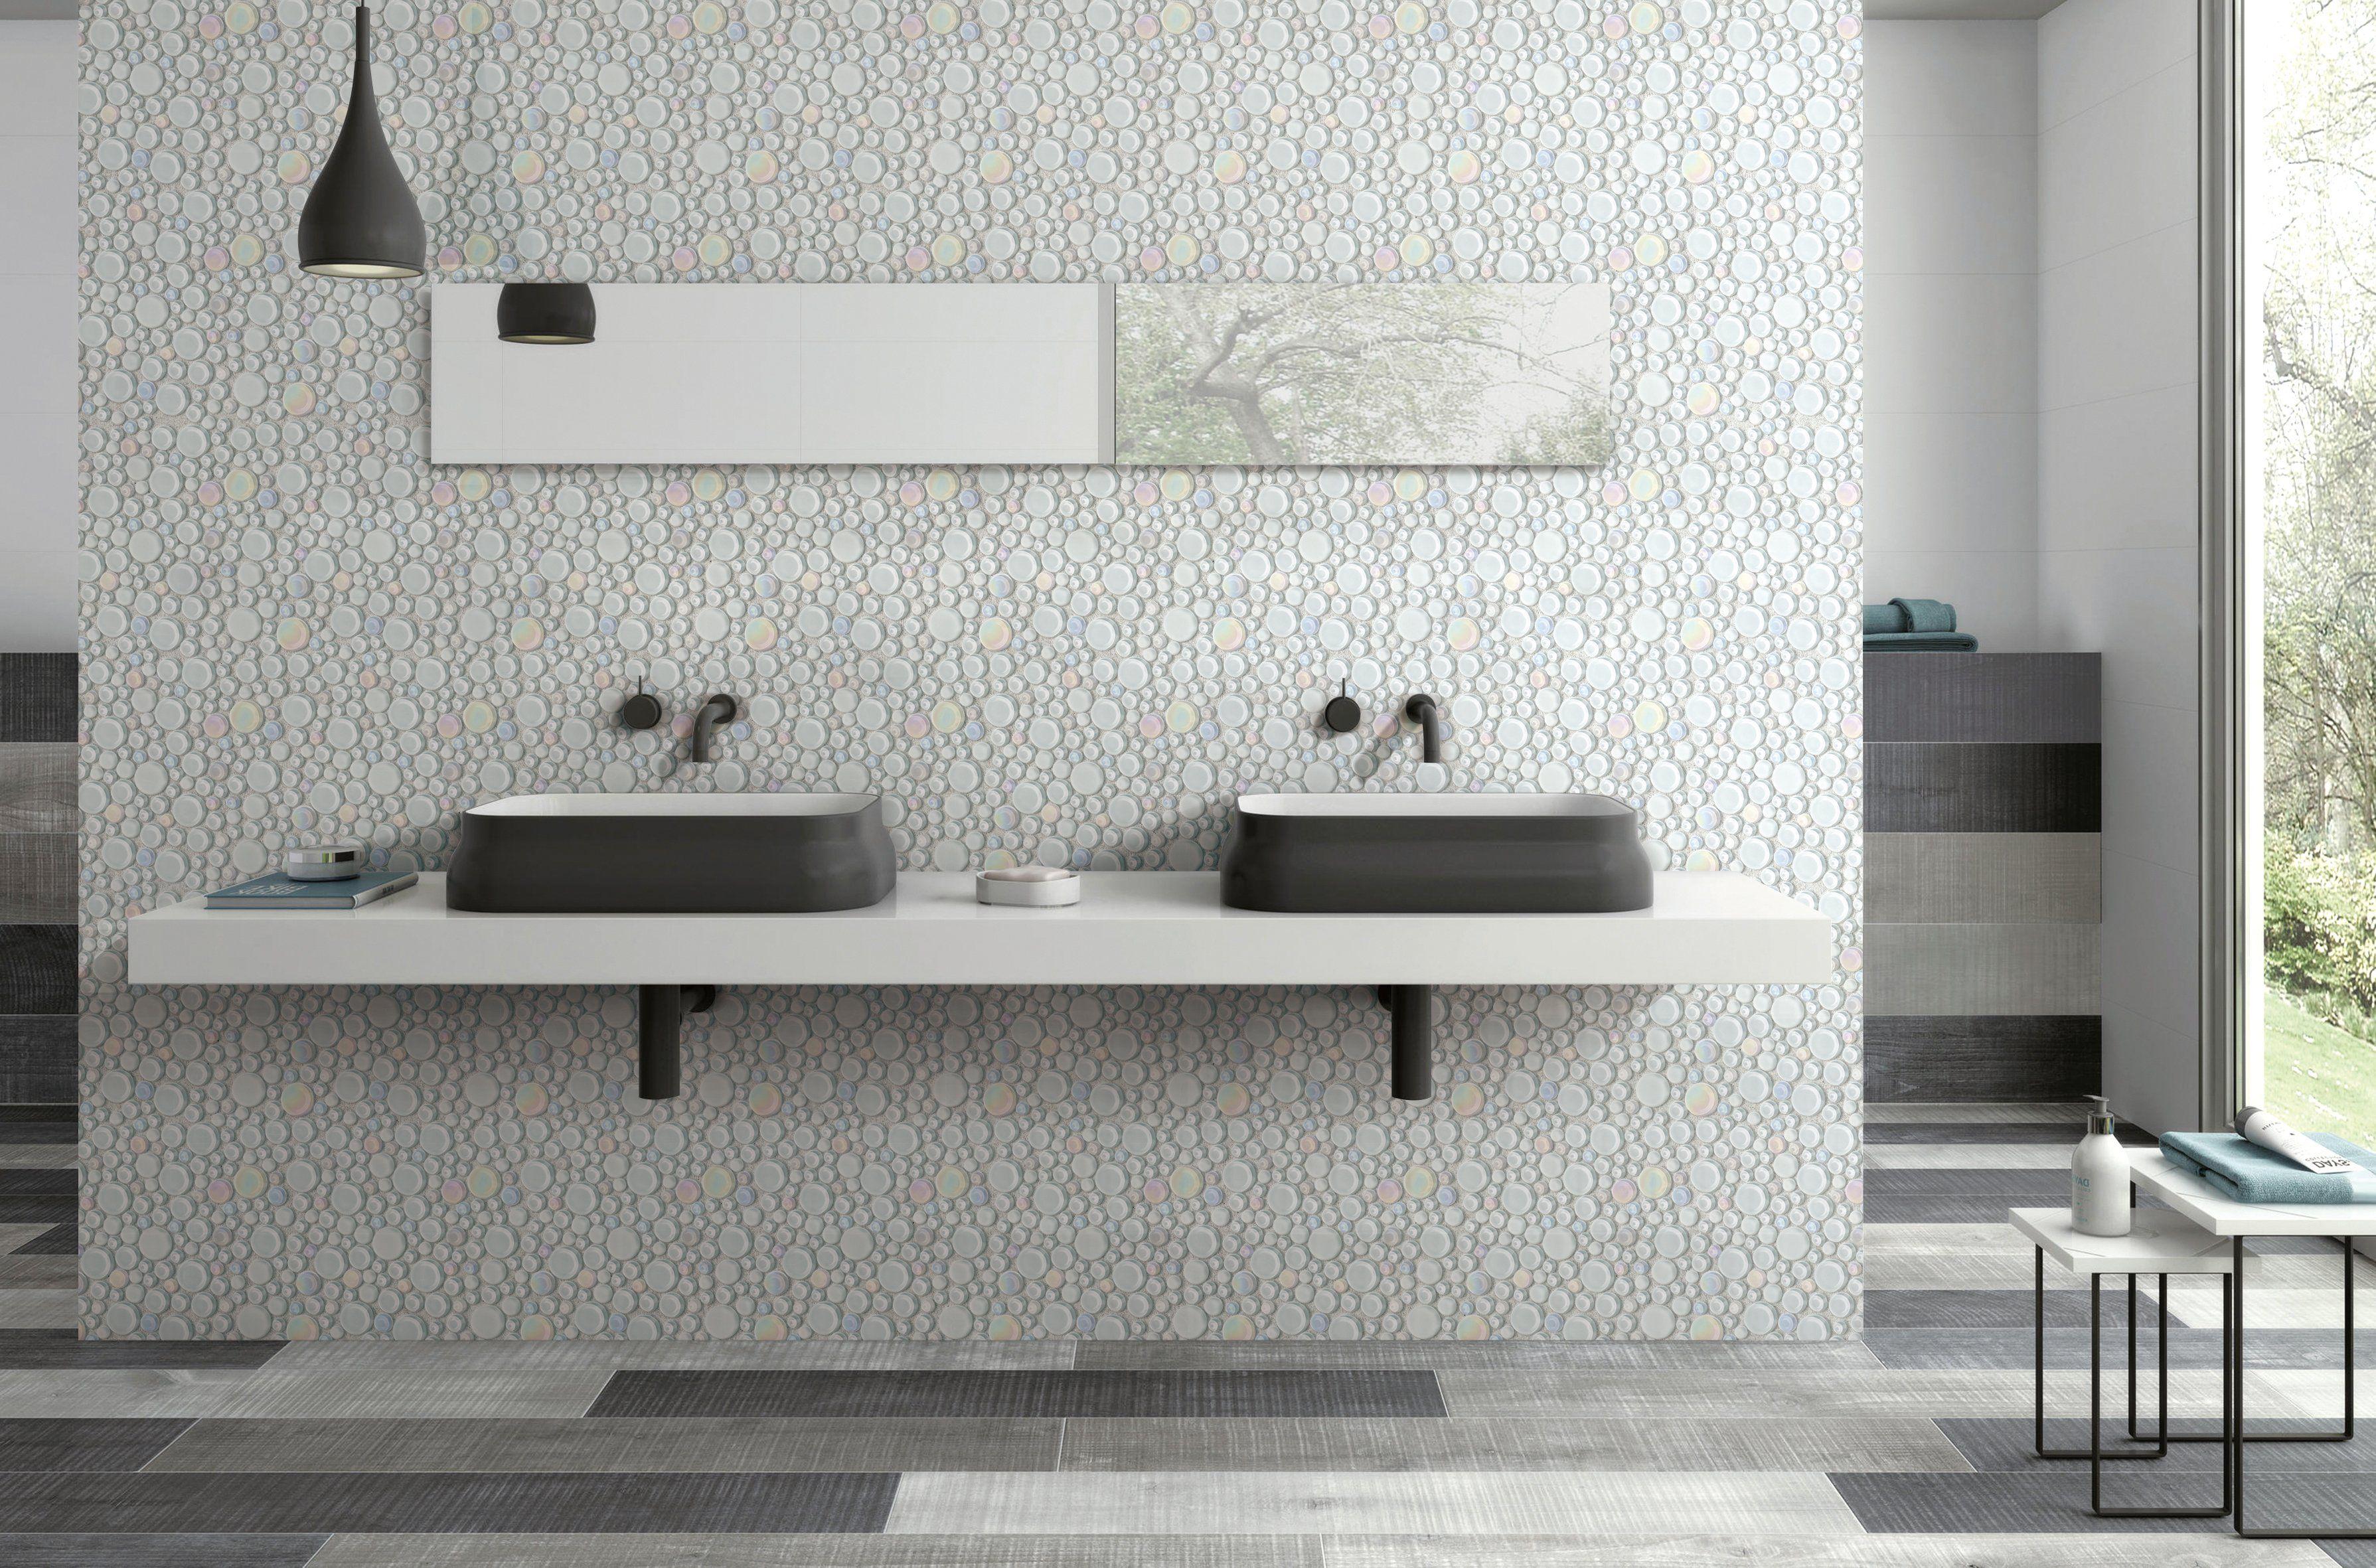 Pin On Glass Mosaic Tile Backsplash Idea